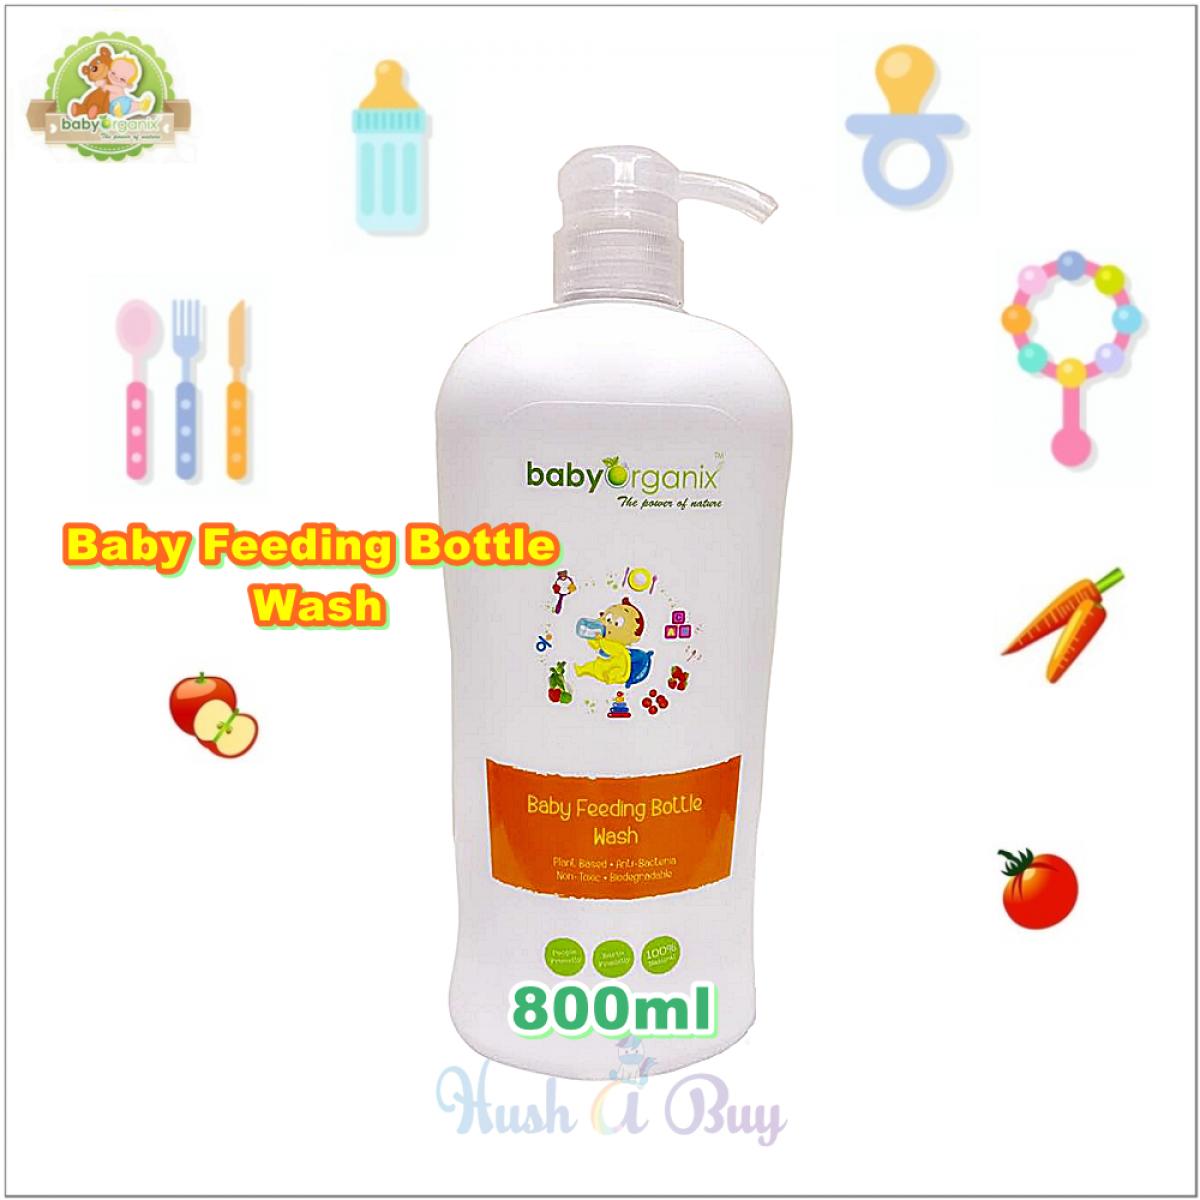 BabyOrganix Baby Feeding Bottle Wash 800ml